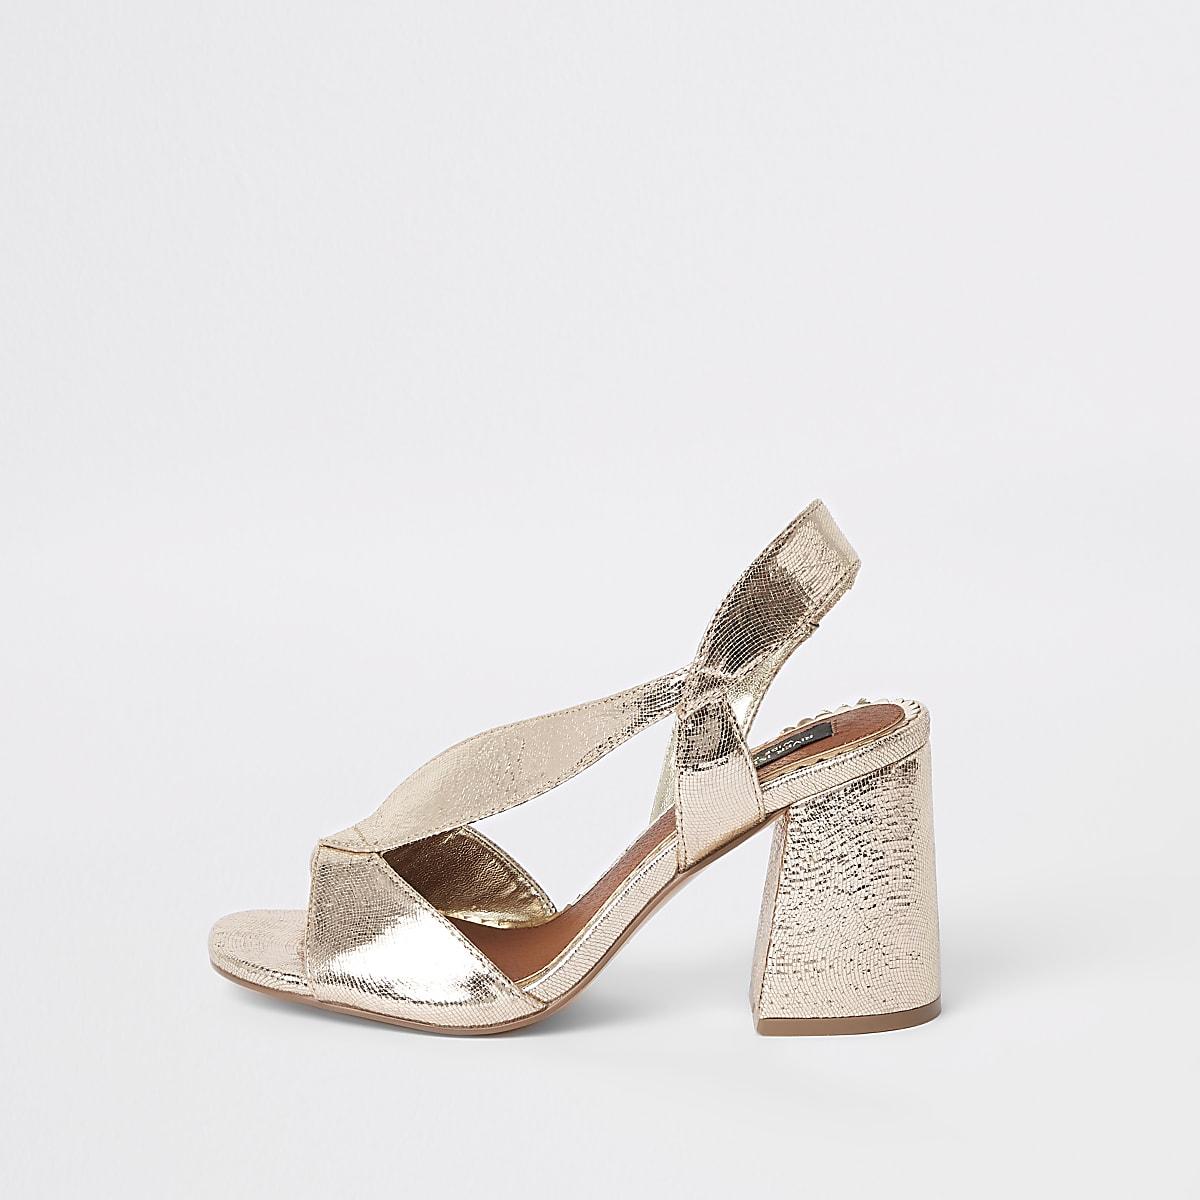 c98f9a17ce329 Gold wide fit cross strap block heel sandals - Sandals - Shoes & Boots -  women